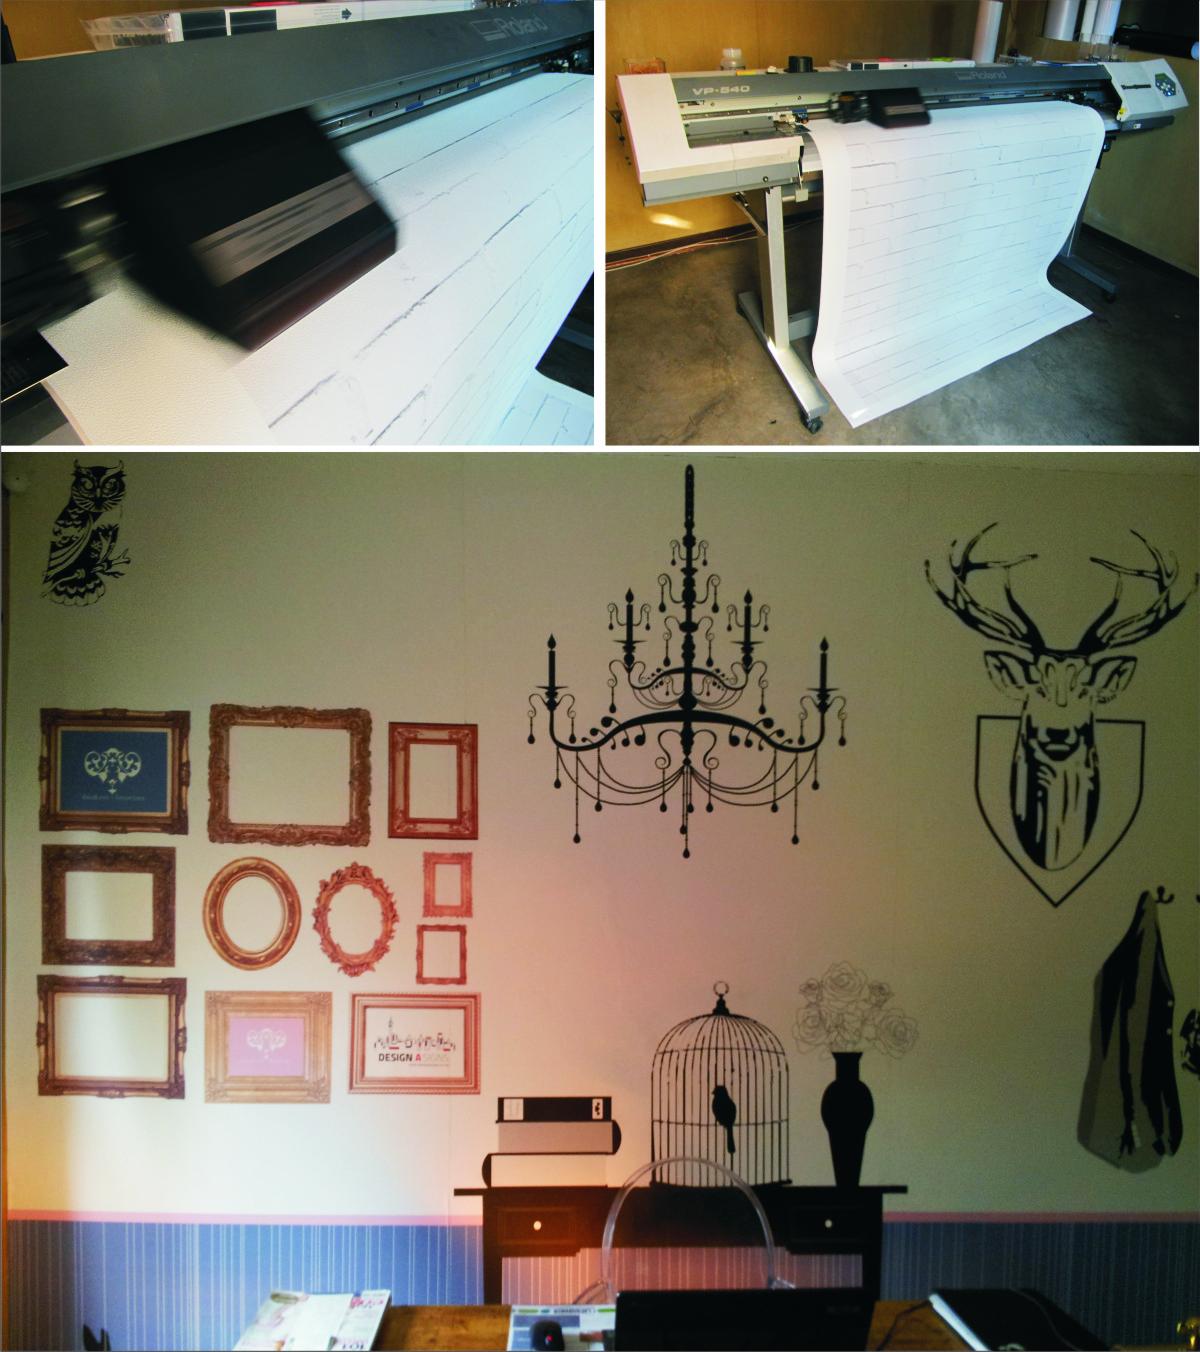 http://4.bp.blogspot.com/-V4t8cfKg76M/UAP9CGqgVMI/AAAAAAAAAMU/iHkO6GrFZss/s1600/Office+wallpaper.jpg